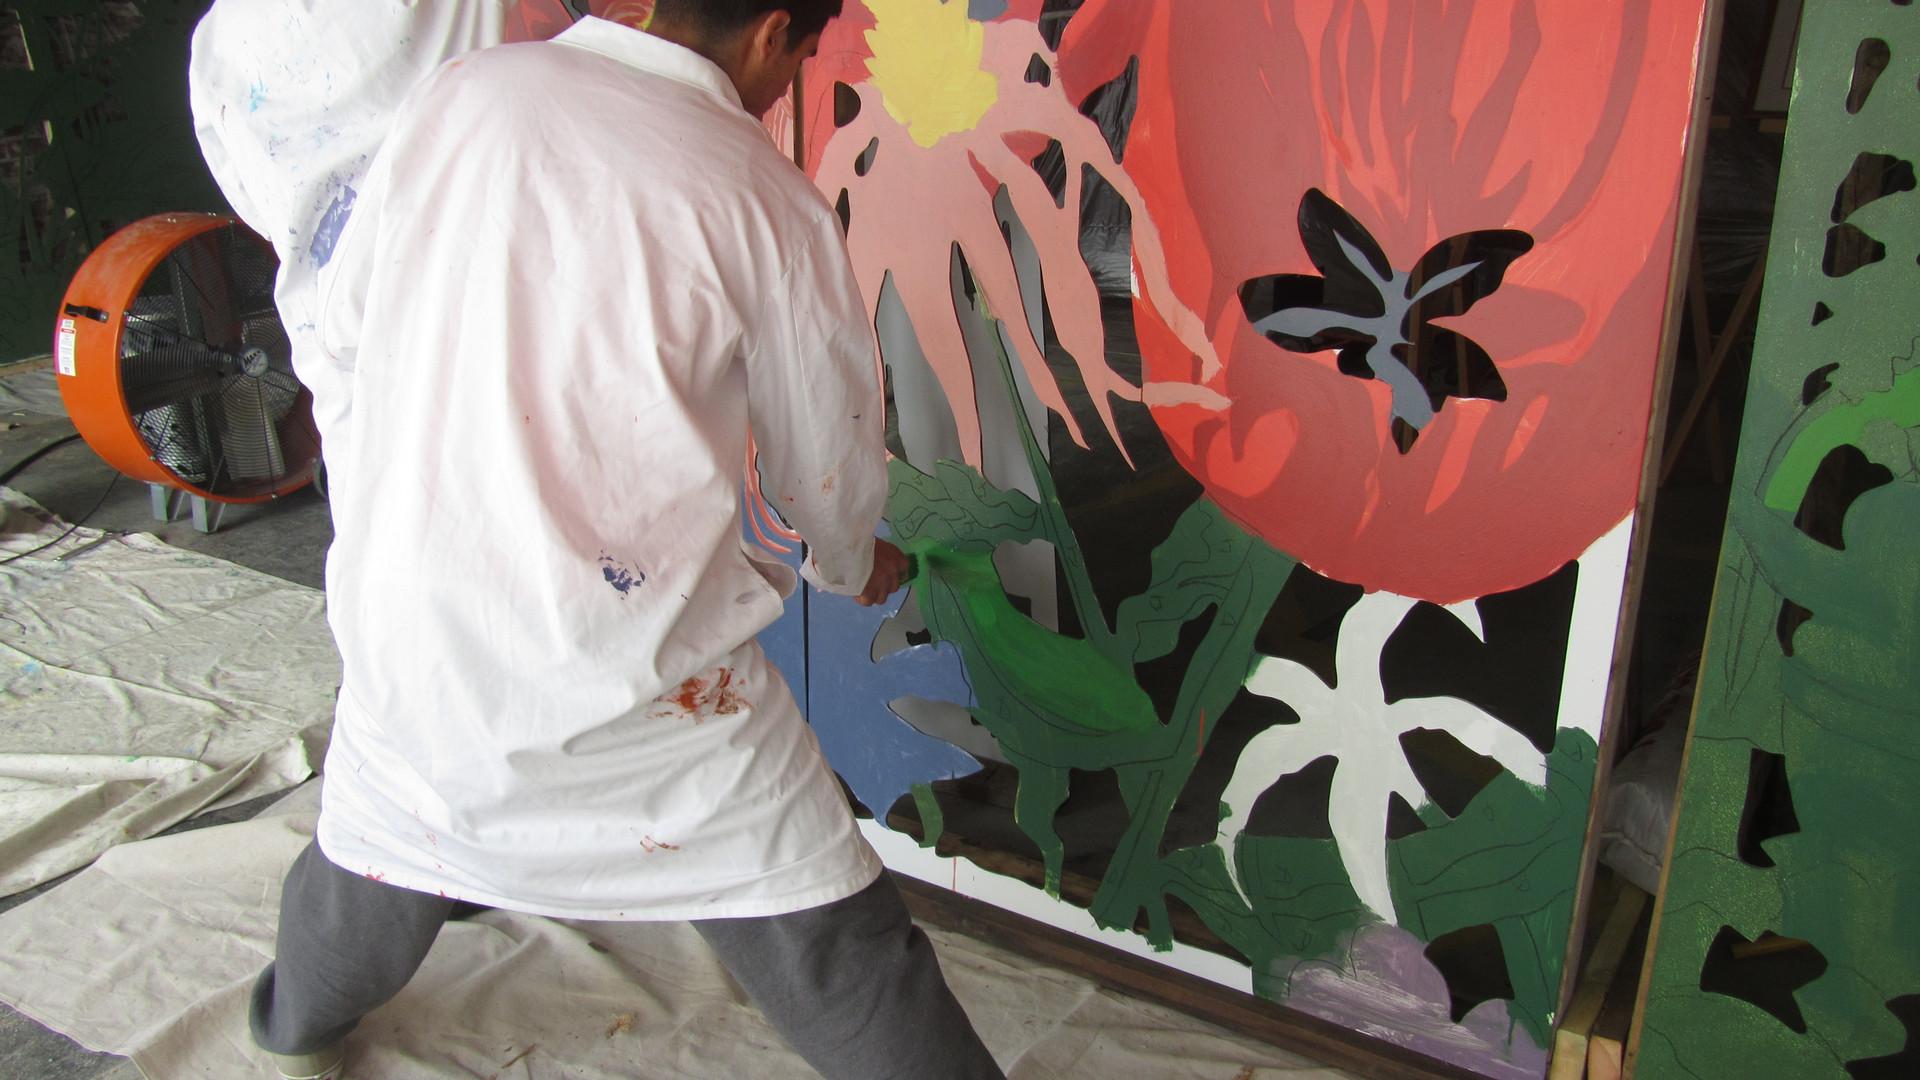 Working with Volunteers